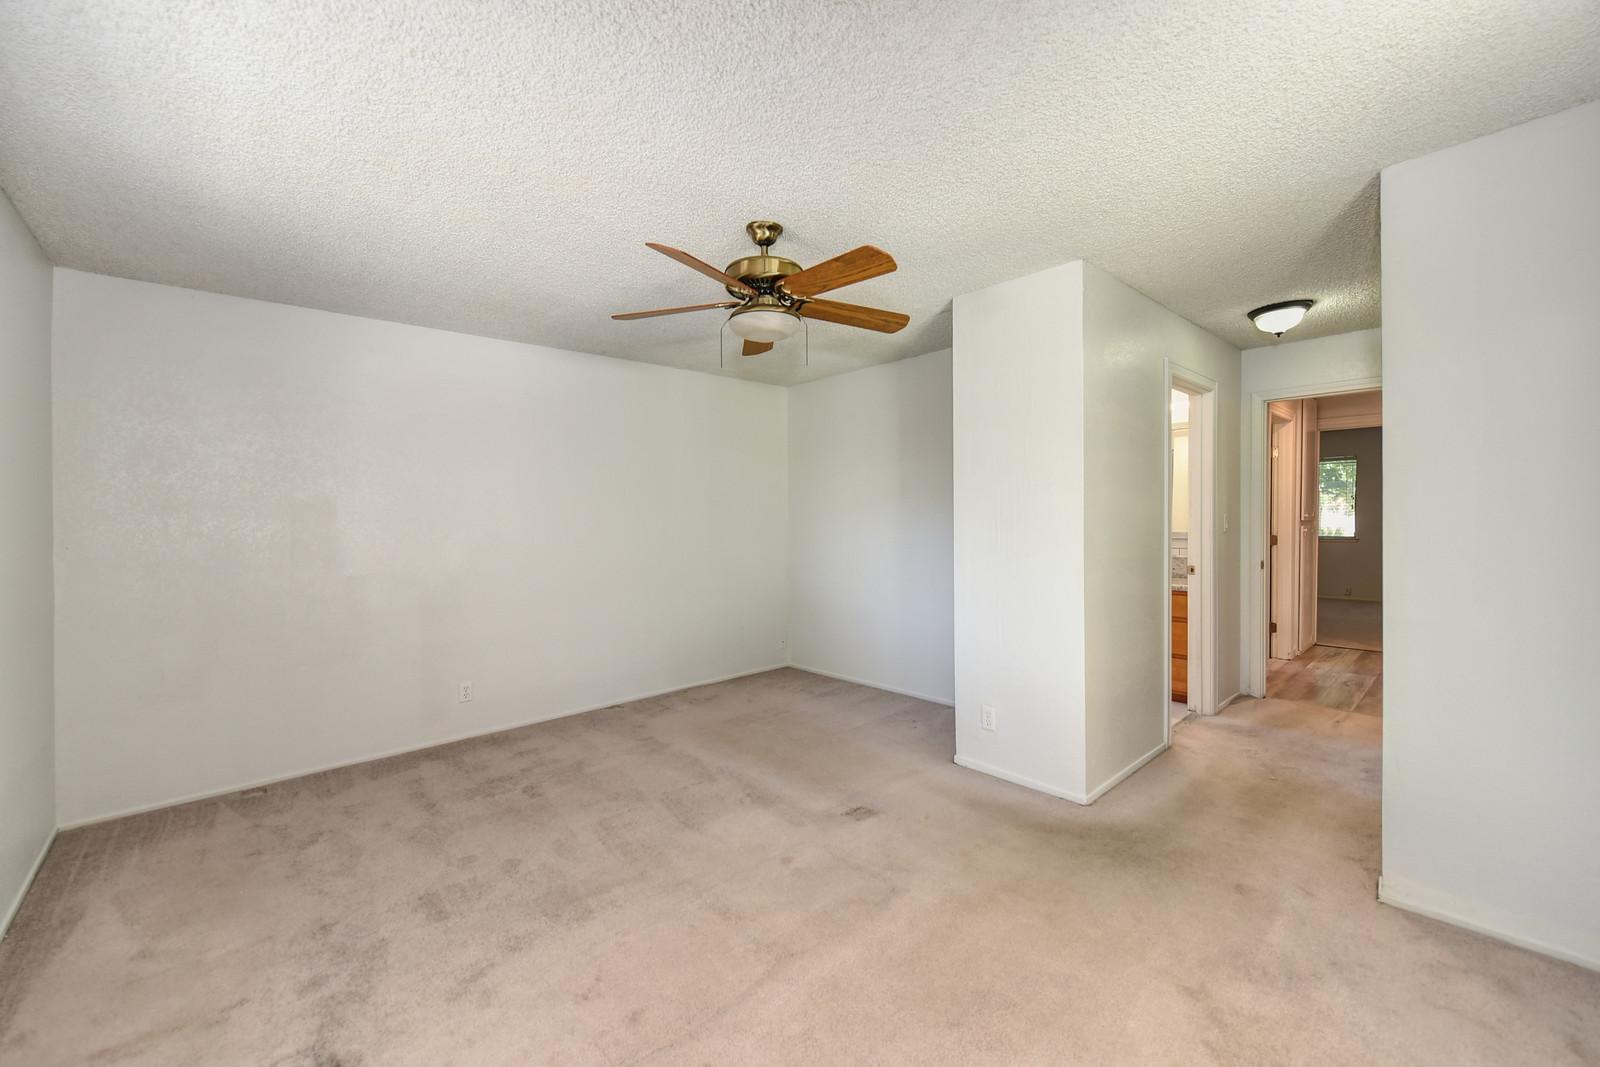 Master bedroom 5342 Nyoda Way Carmichael California | Realtor in Carmichael California